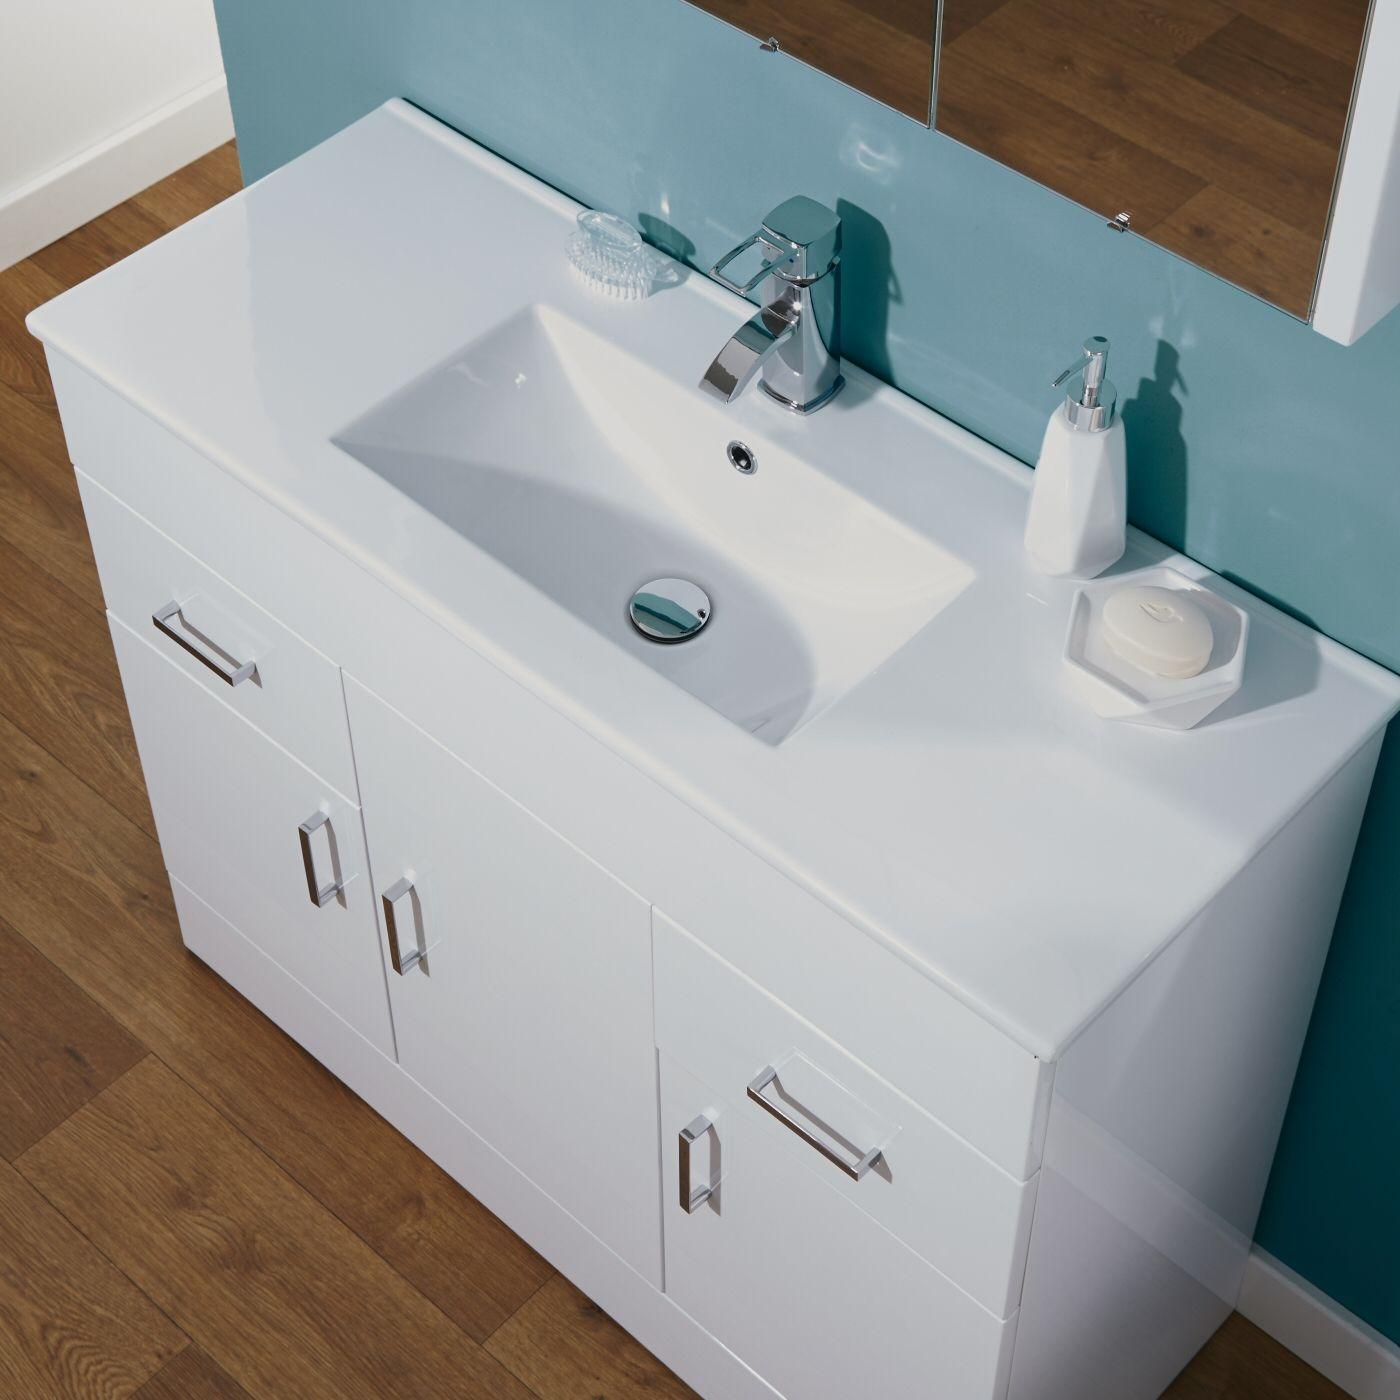 Minimalist gloss white vanity unit 600 800 or 1000mm - Milano Minimalist 1000mm White Gloss Bathroom Vanity Unit